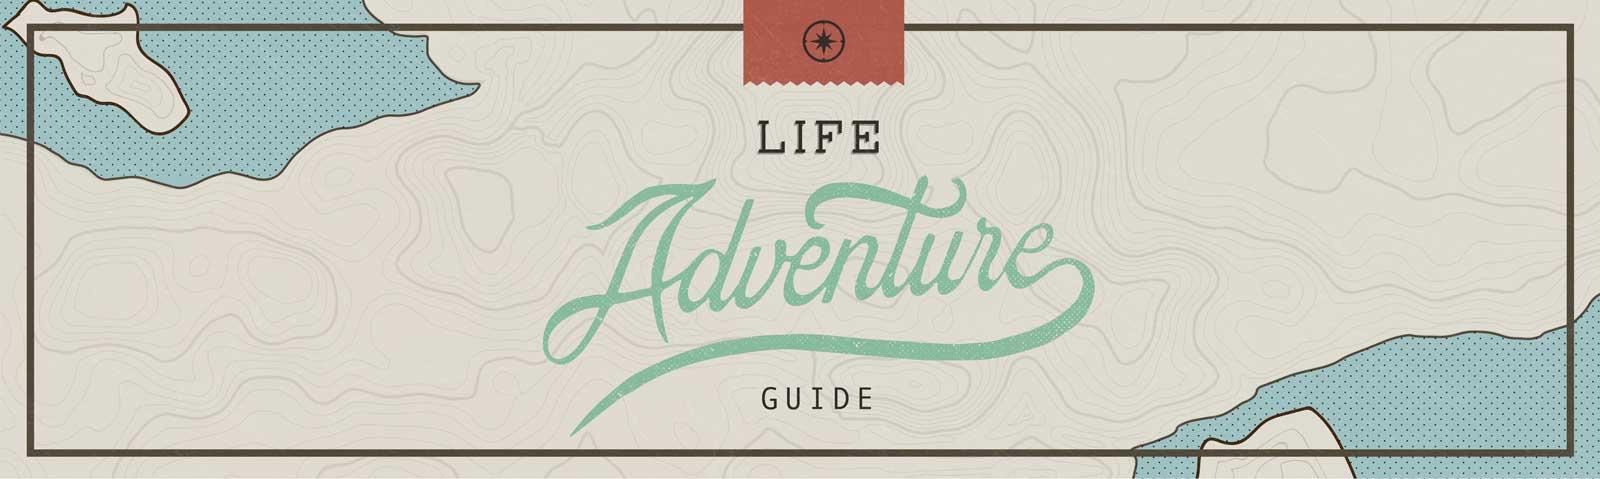 lifeadventure.jpg